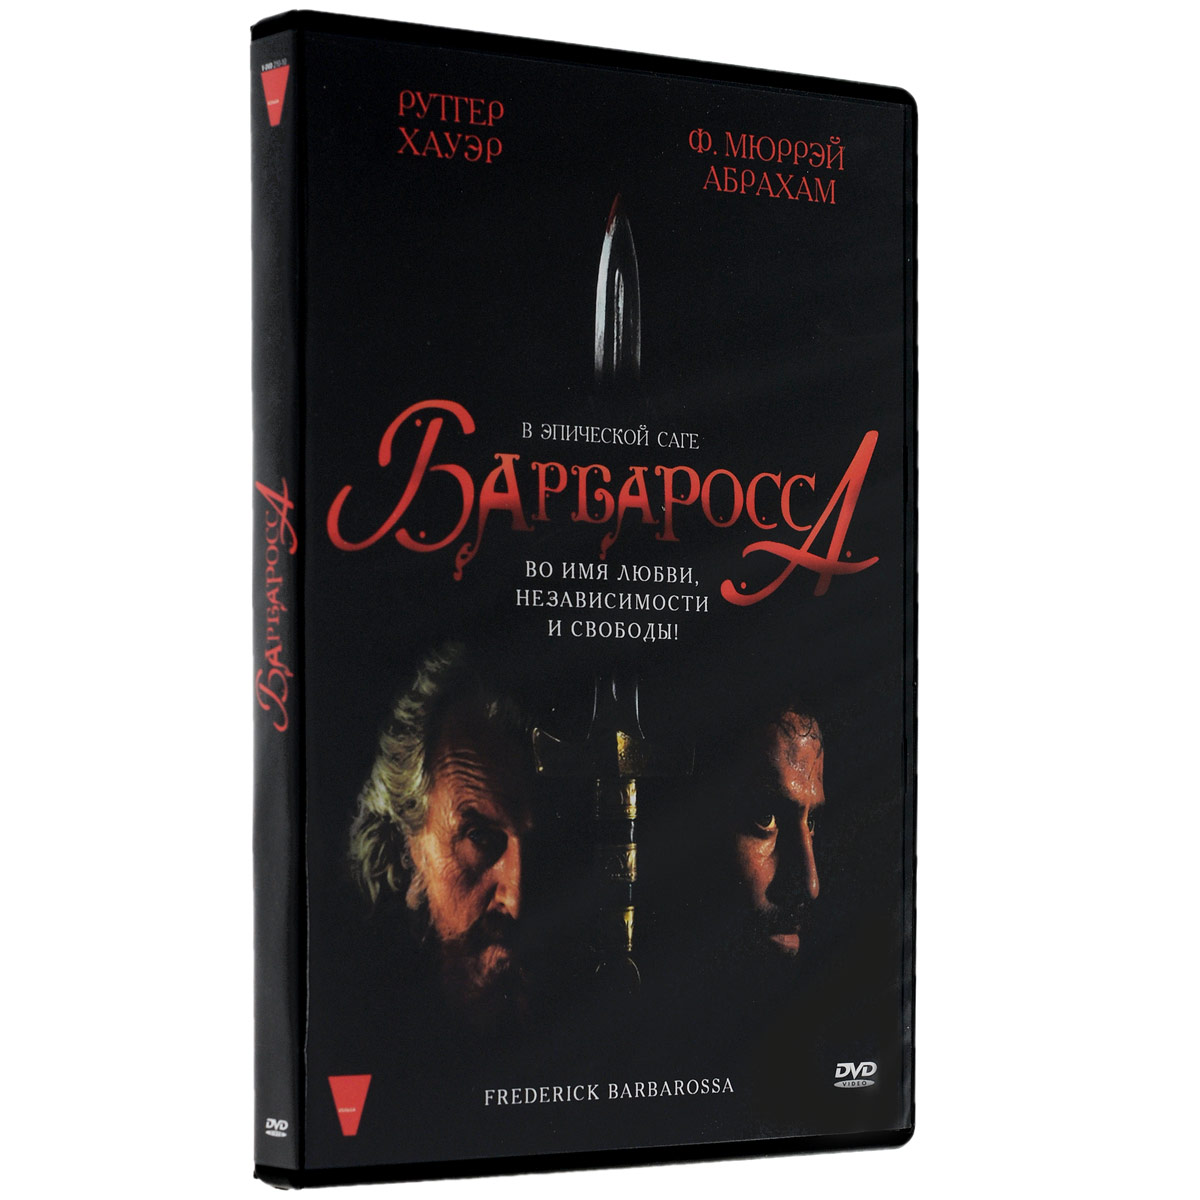 Барбаросса (2 DVD)